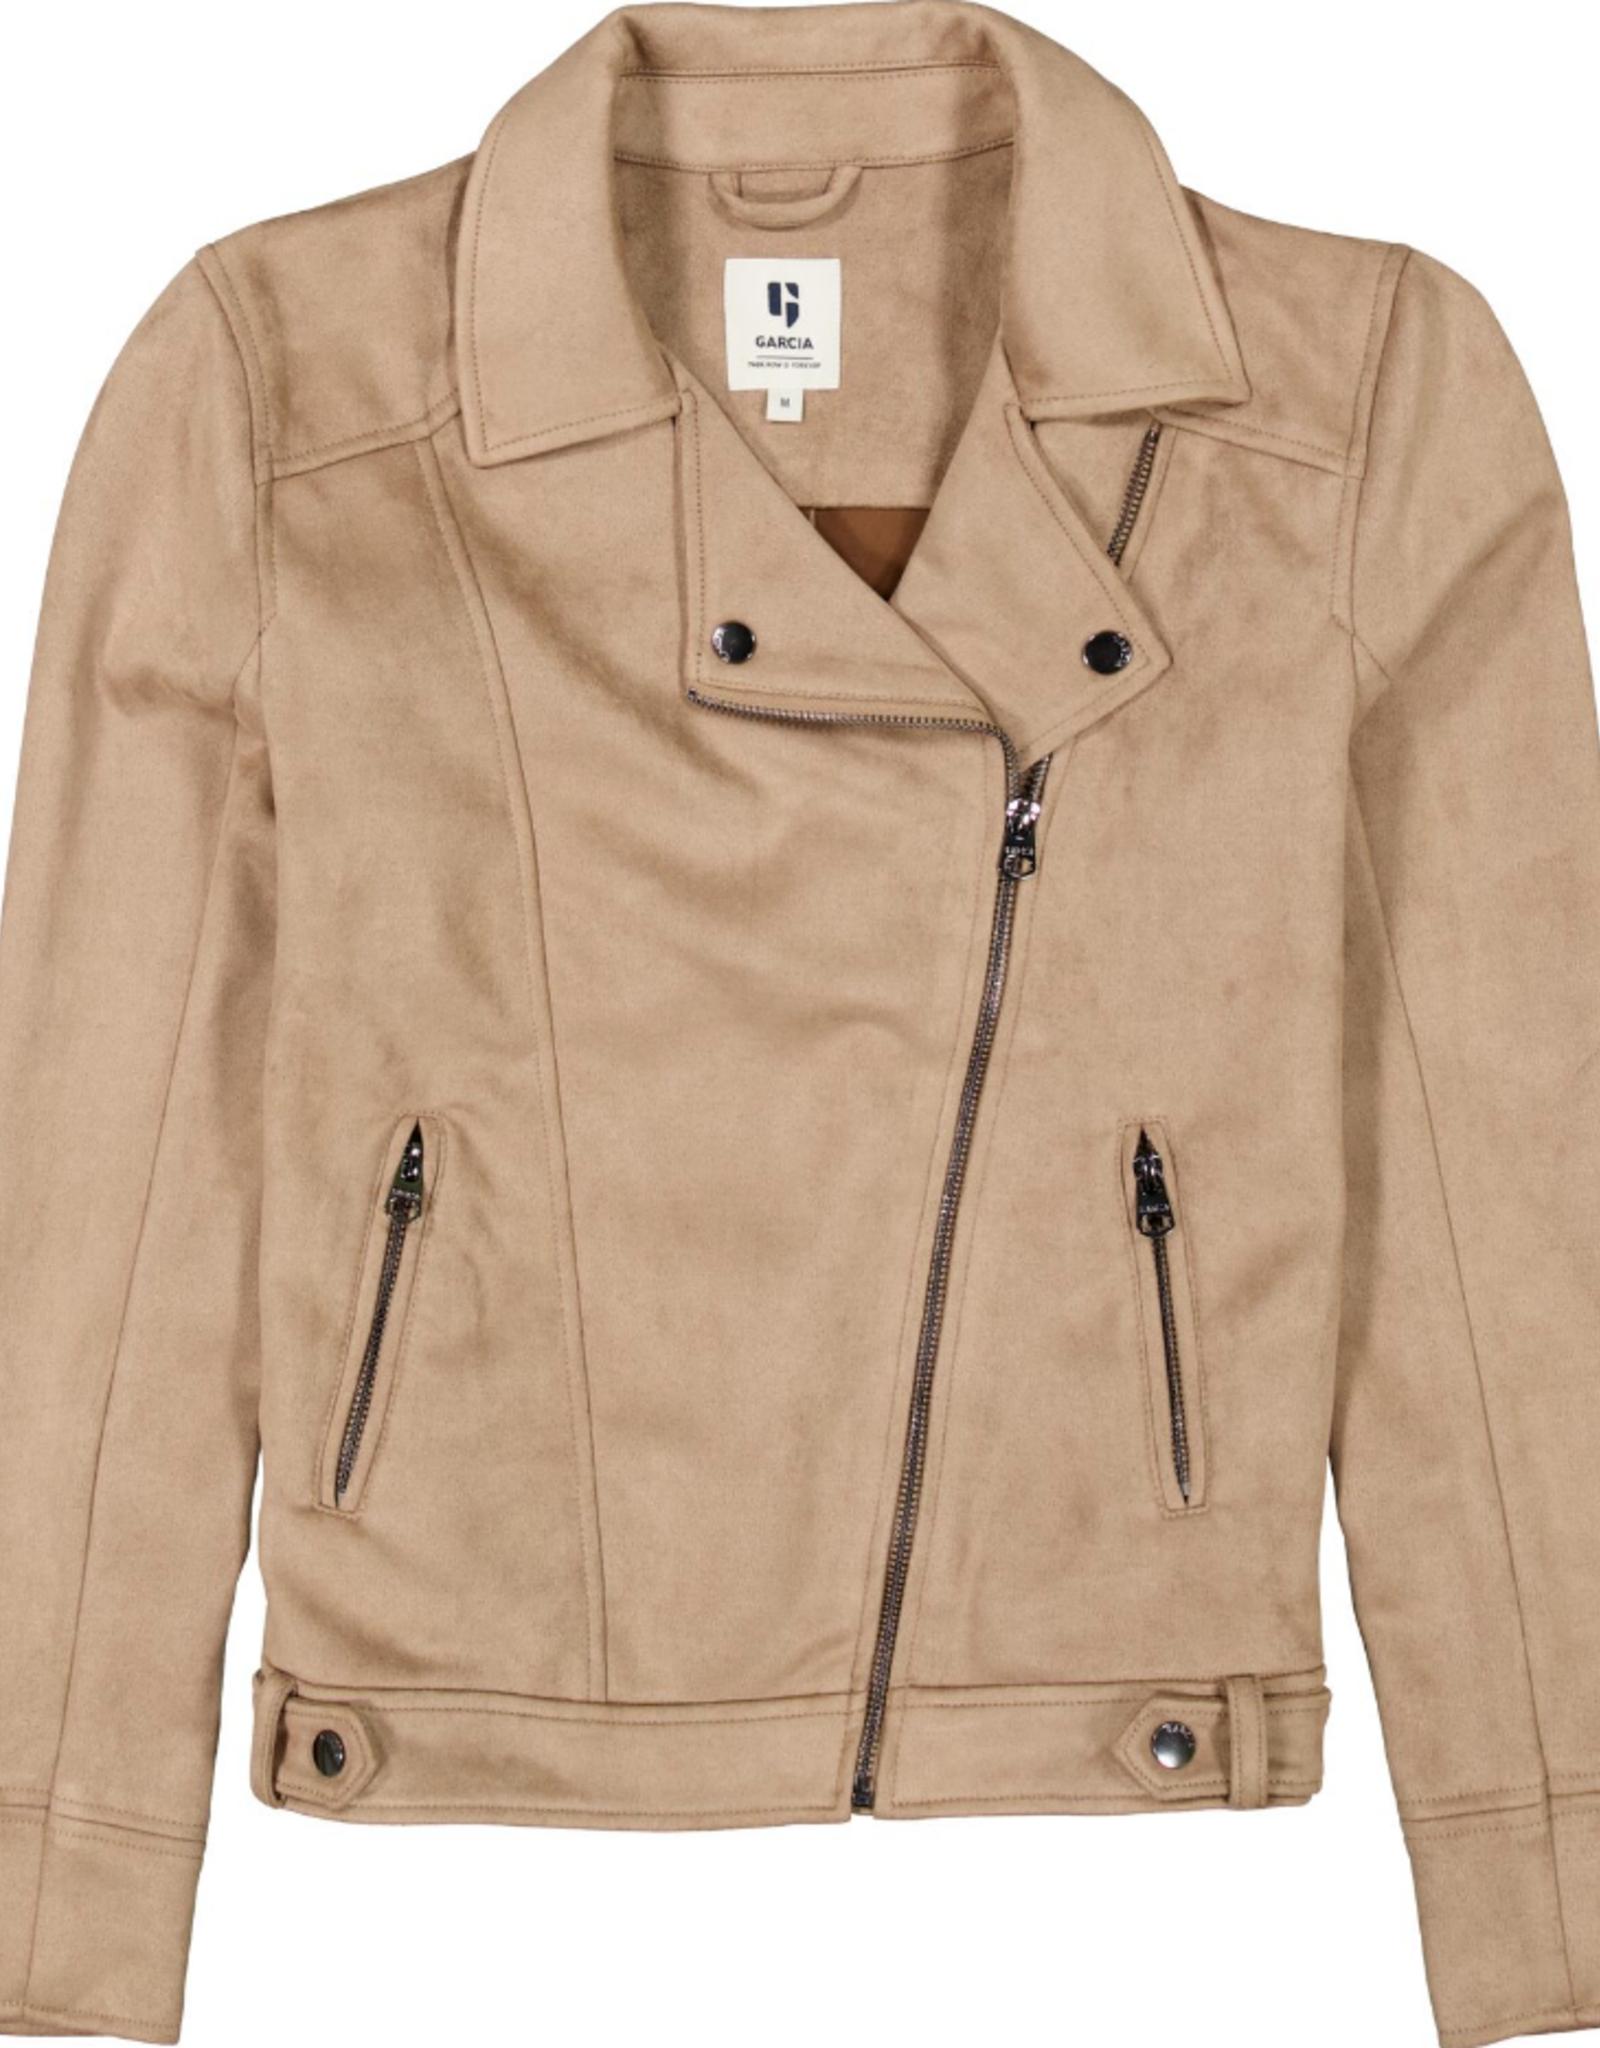 Garcia Garcia - GS100890 Jacket